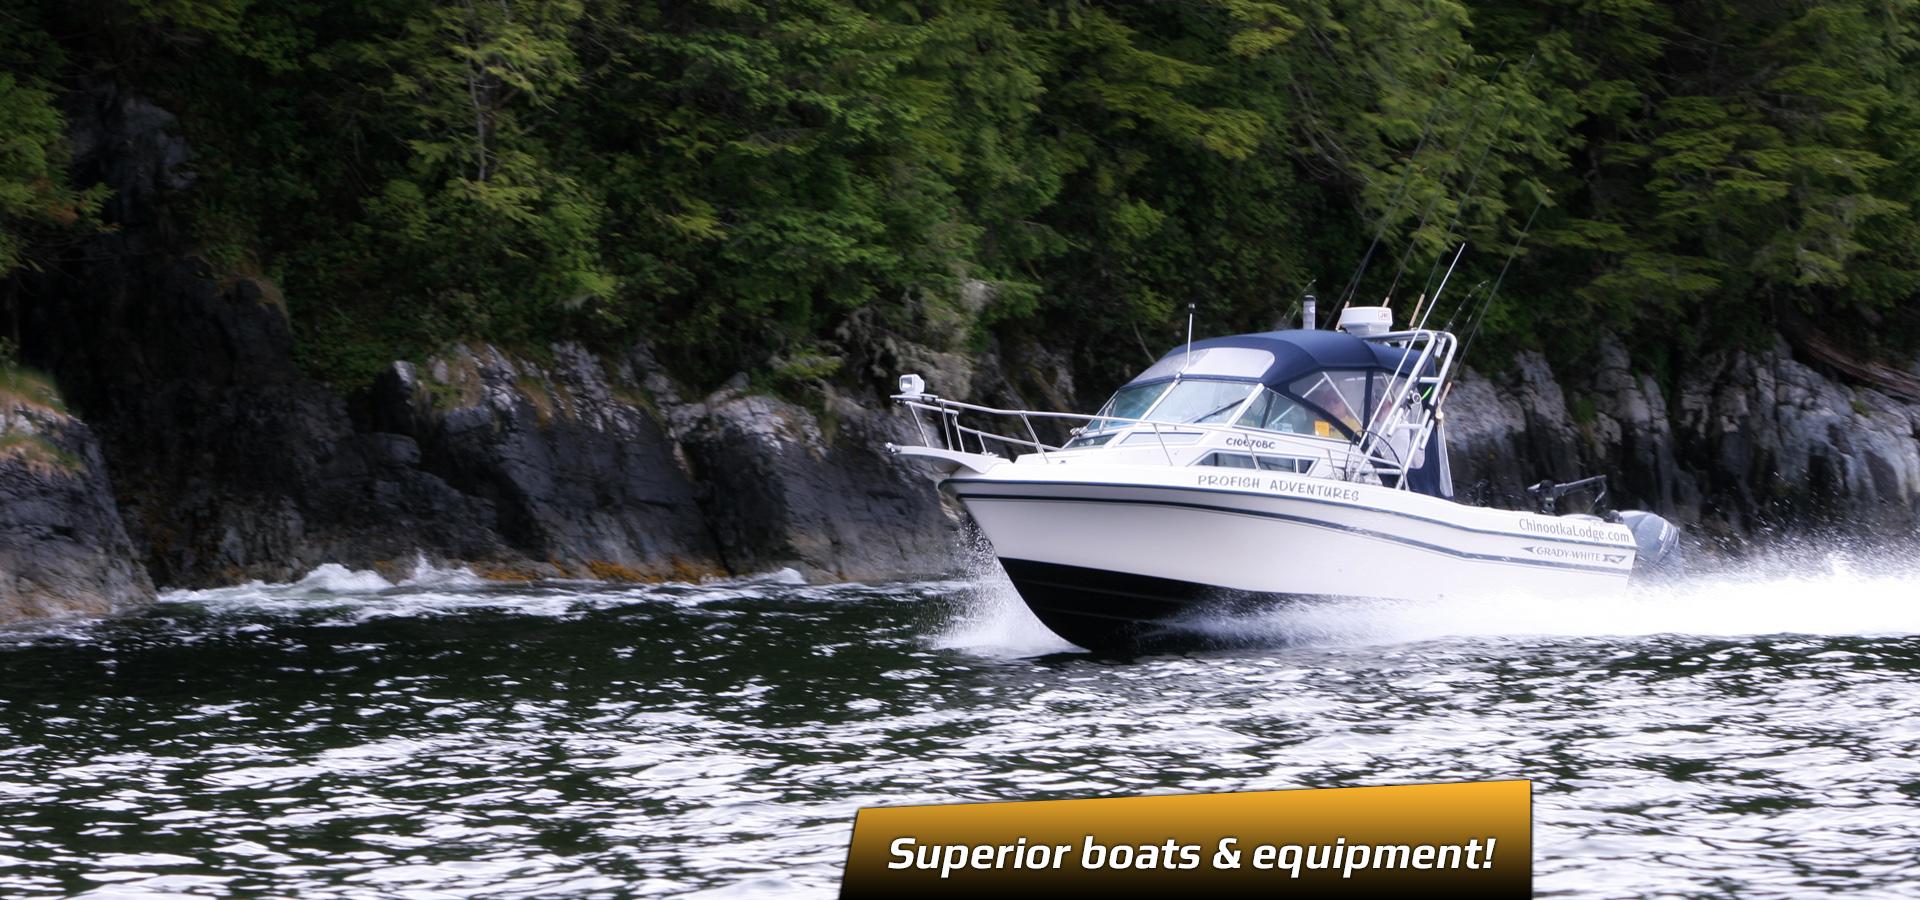 profish superior boats